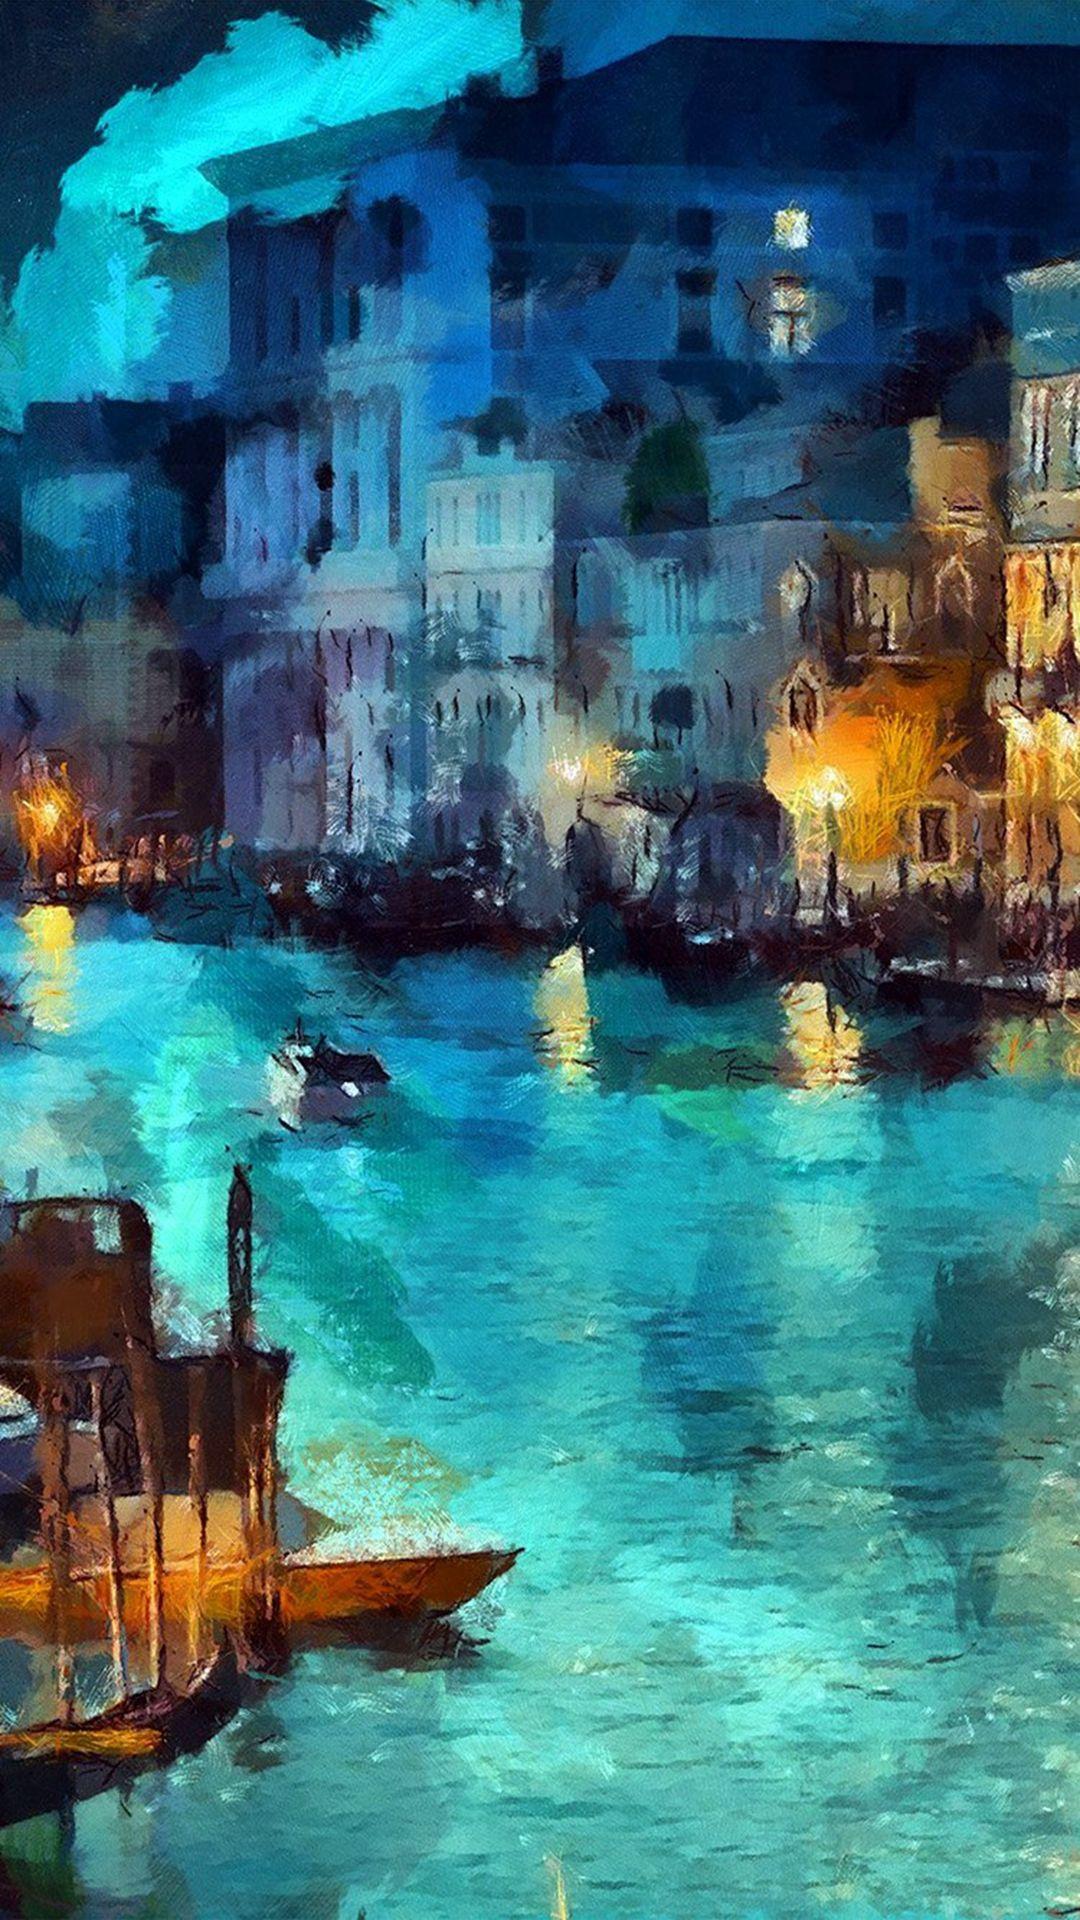 Art Classic Painting Water Lake Night Blue iPhone 6 plus 1080x1920